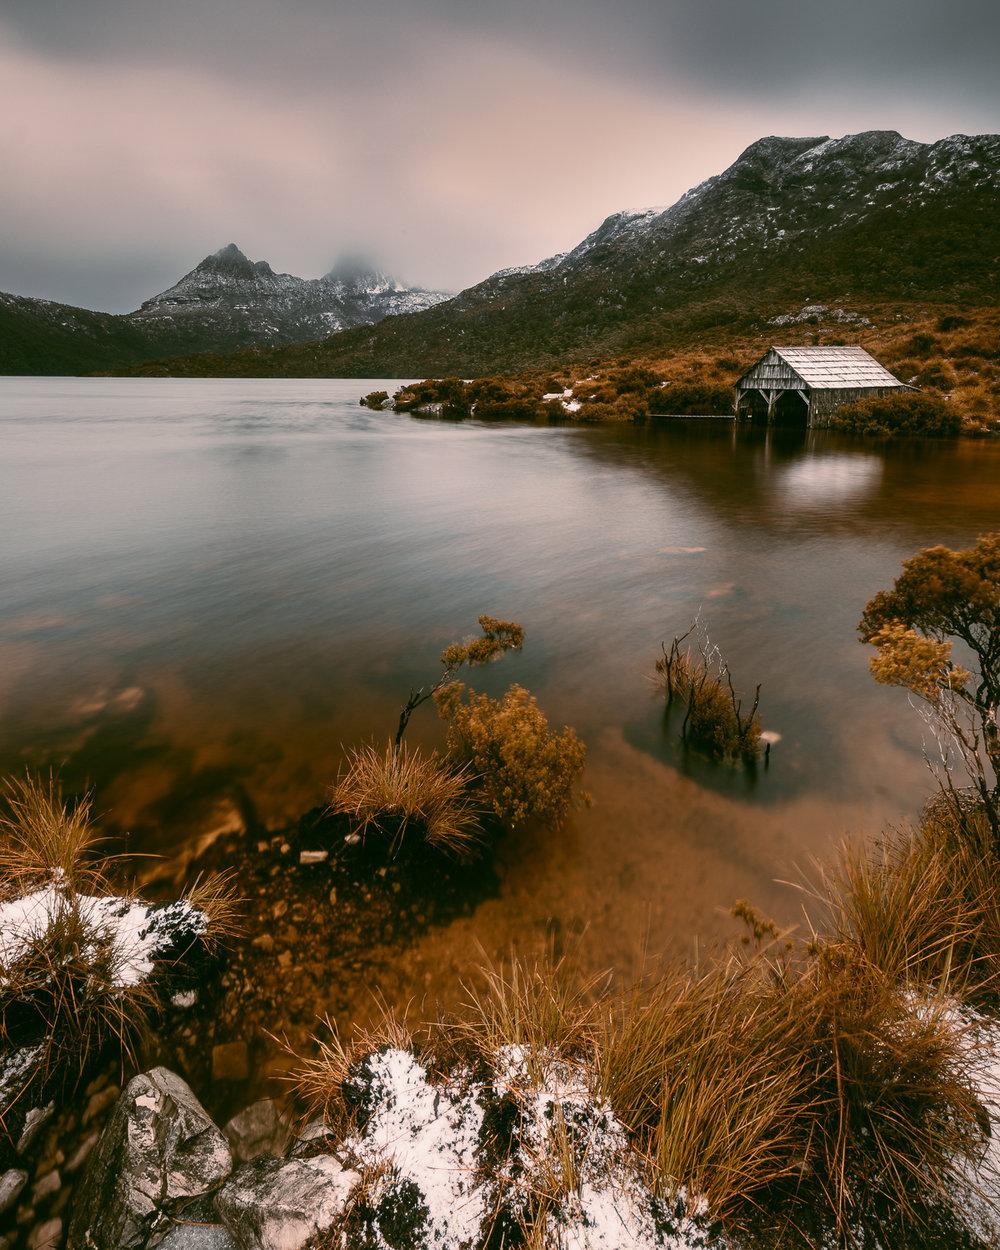 Melissa-Findley-Cradle-Mountain-Lodge-MFBLOG-03.jpg